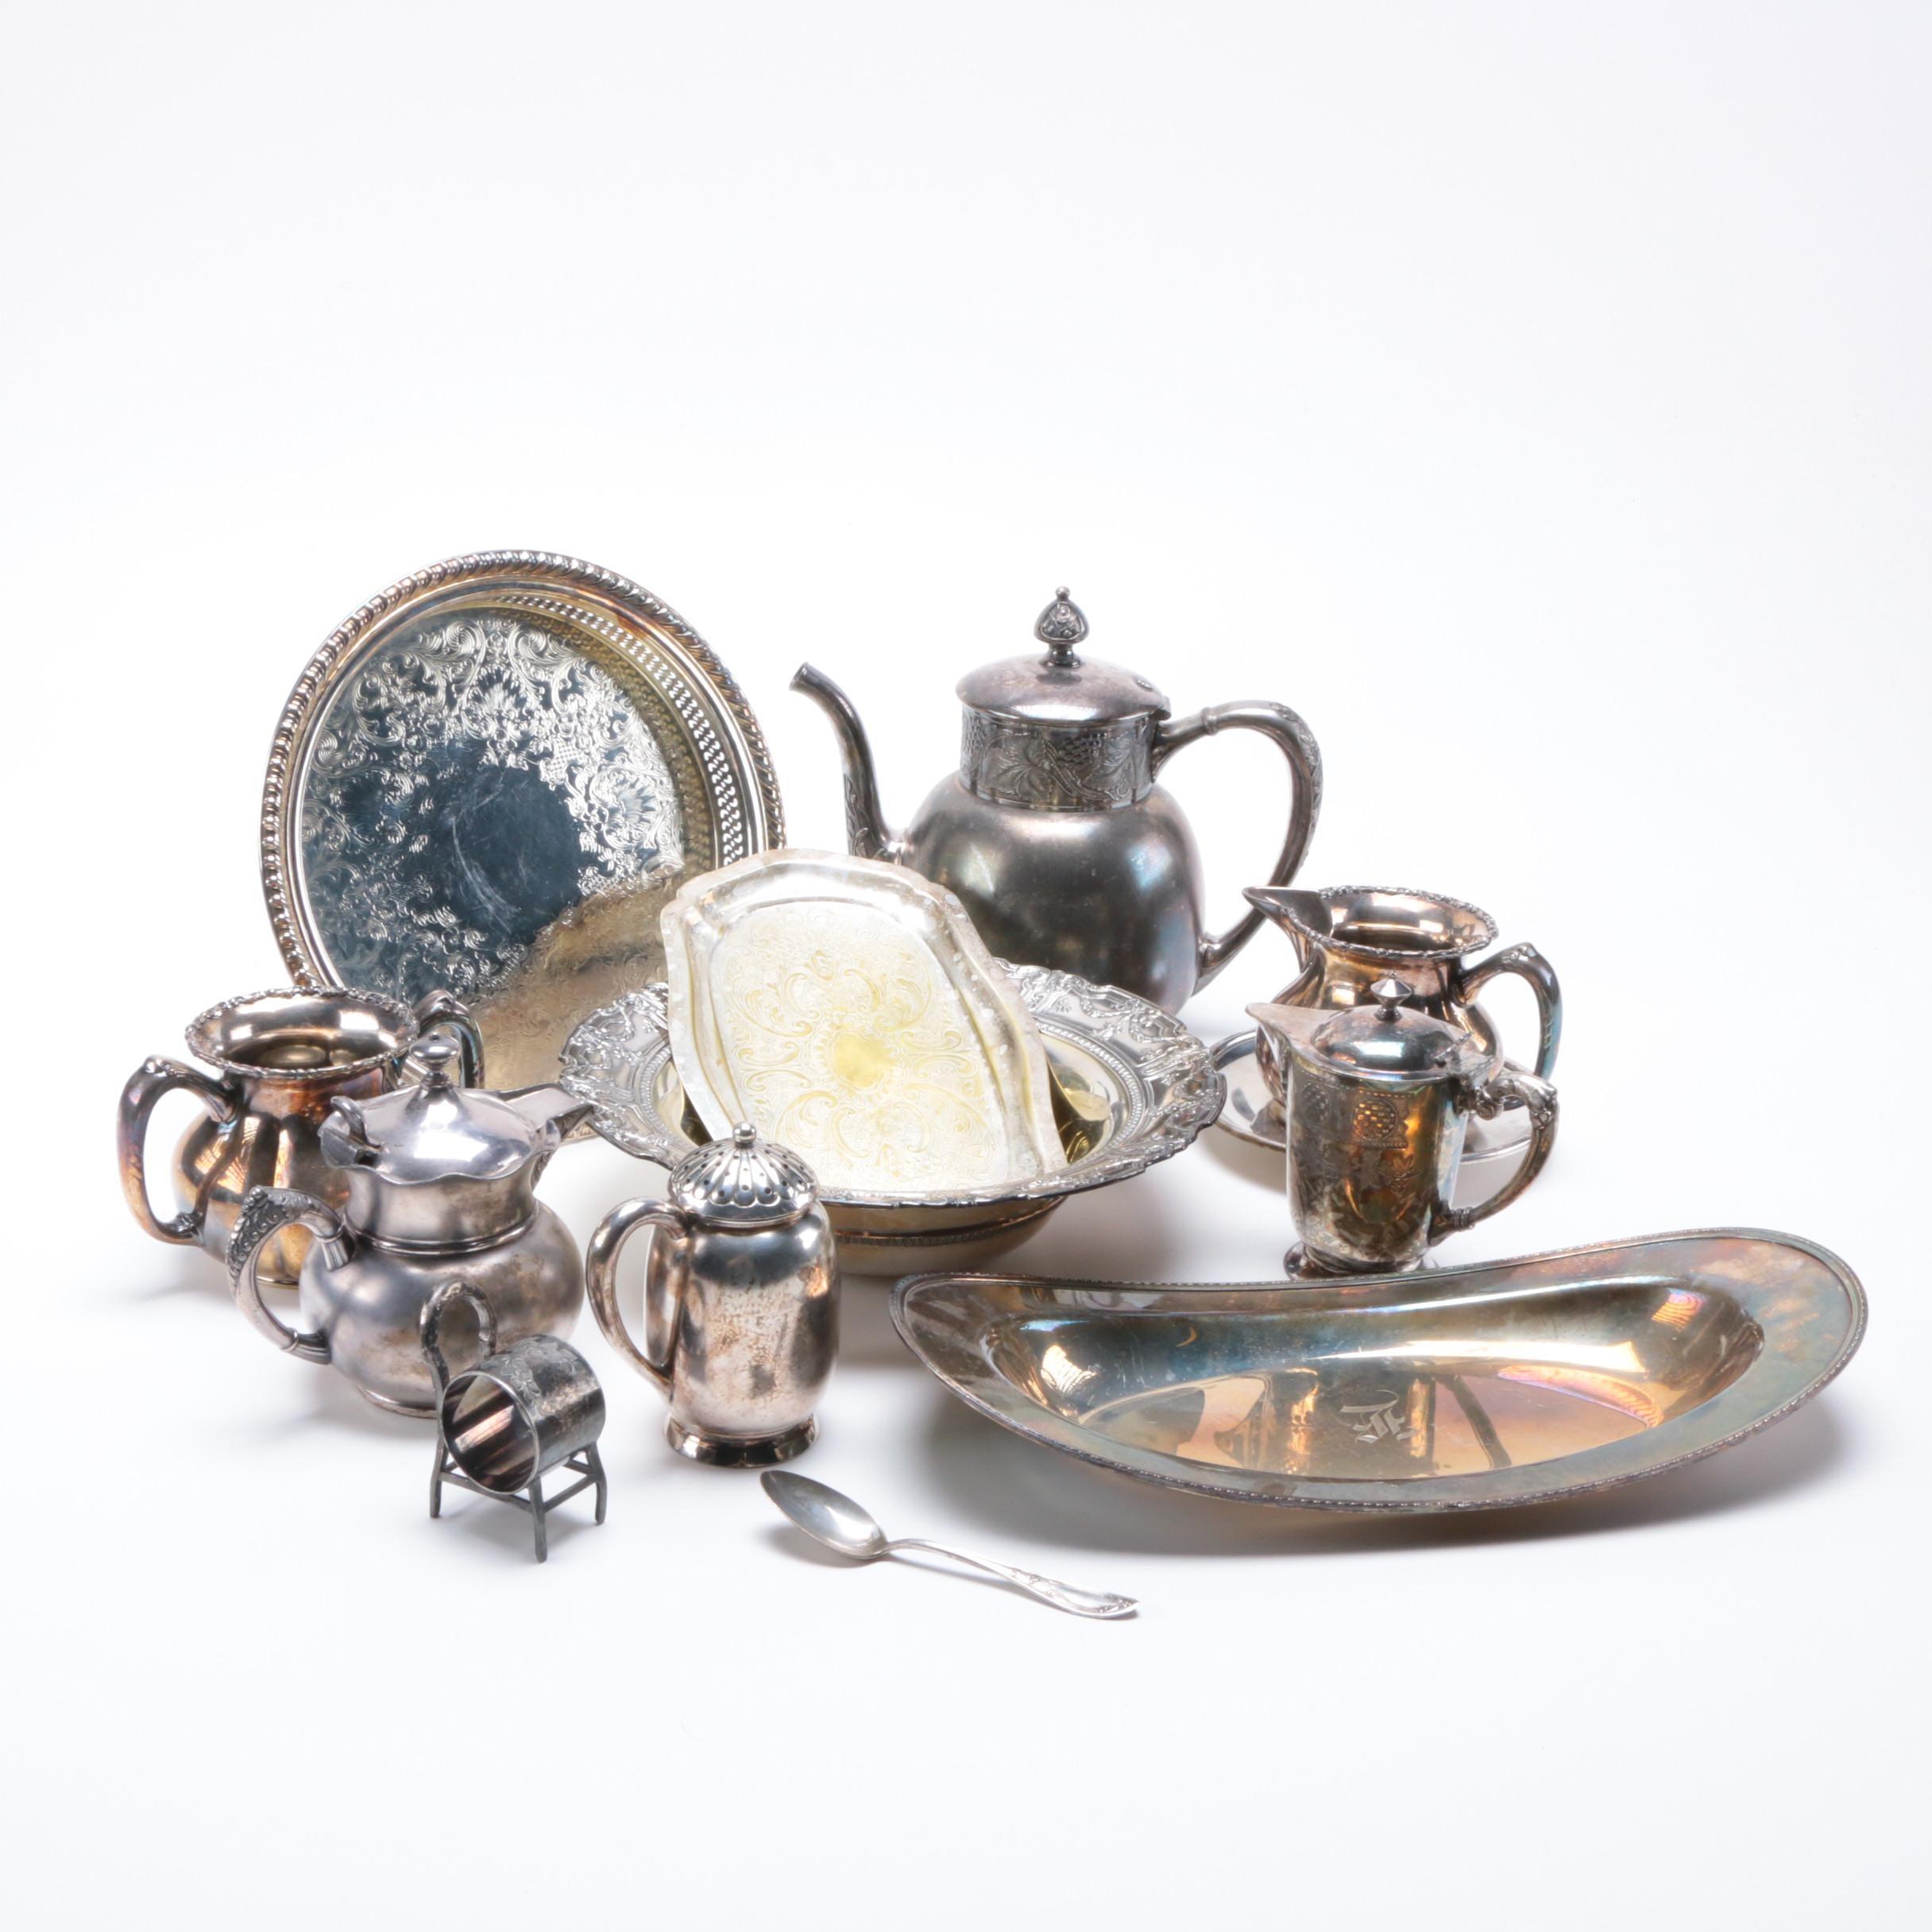 Assortment of Metal Serving Pieces